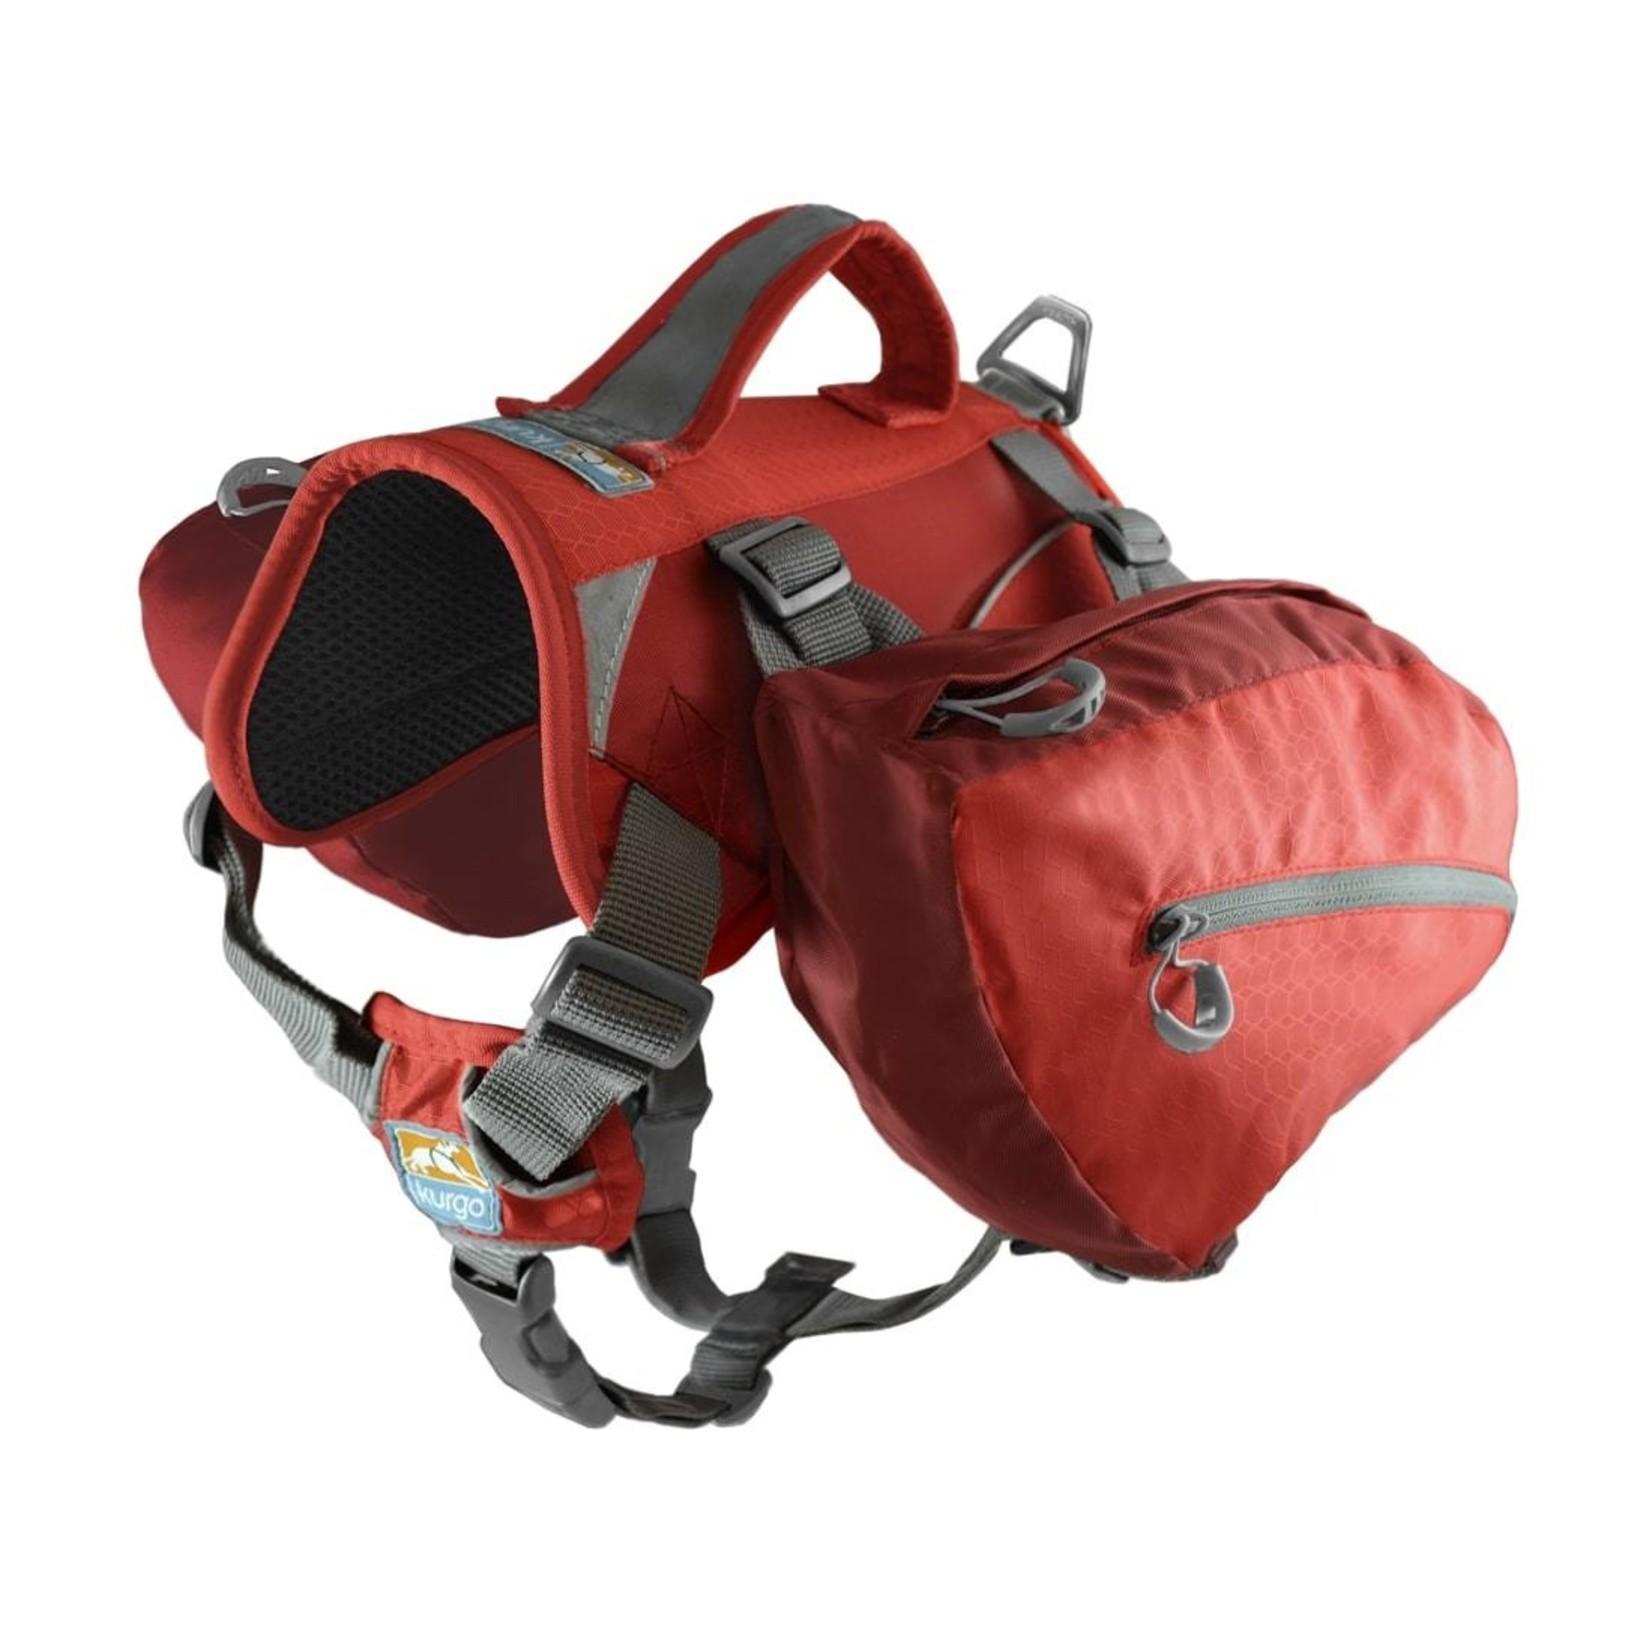 Kurgo Baxter backpack chili/barn red